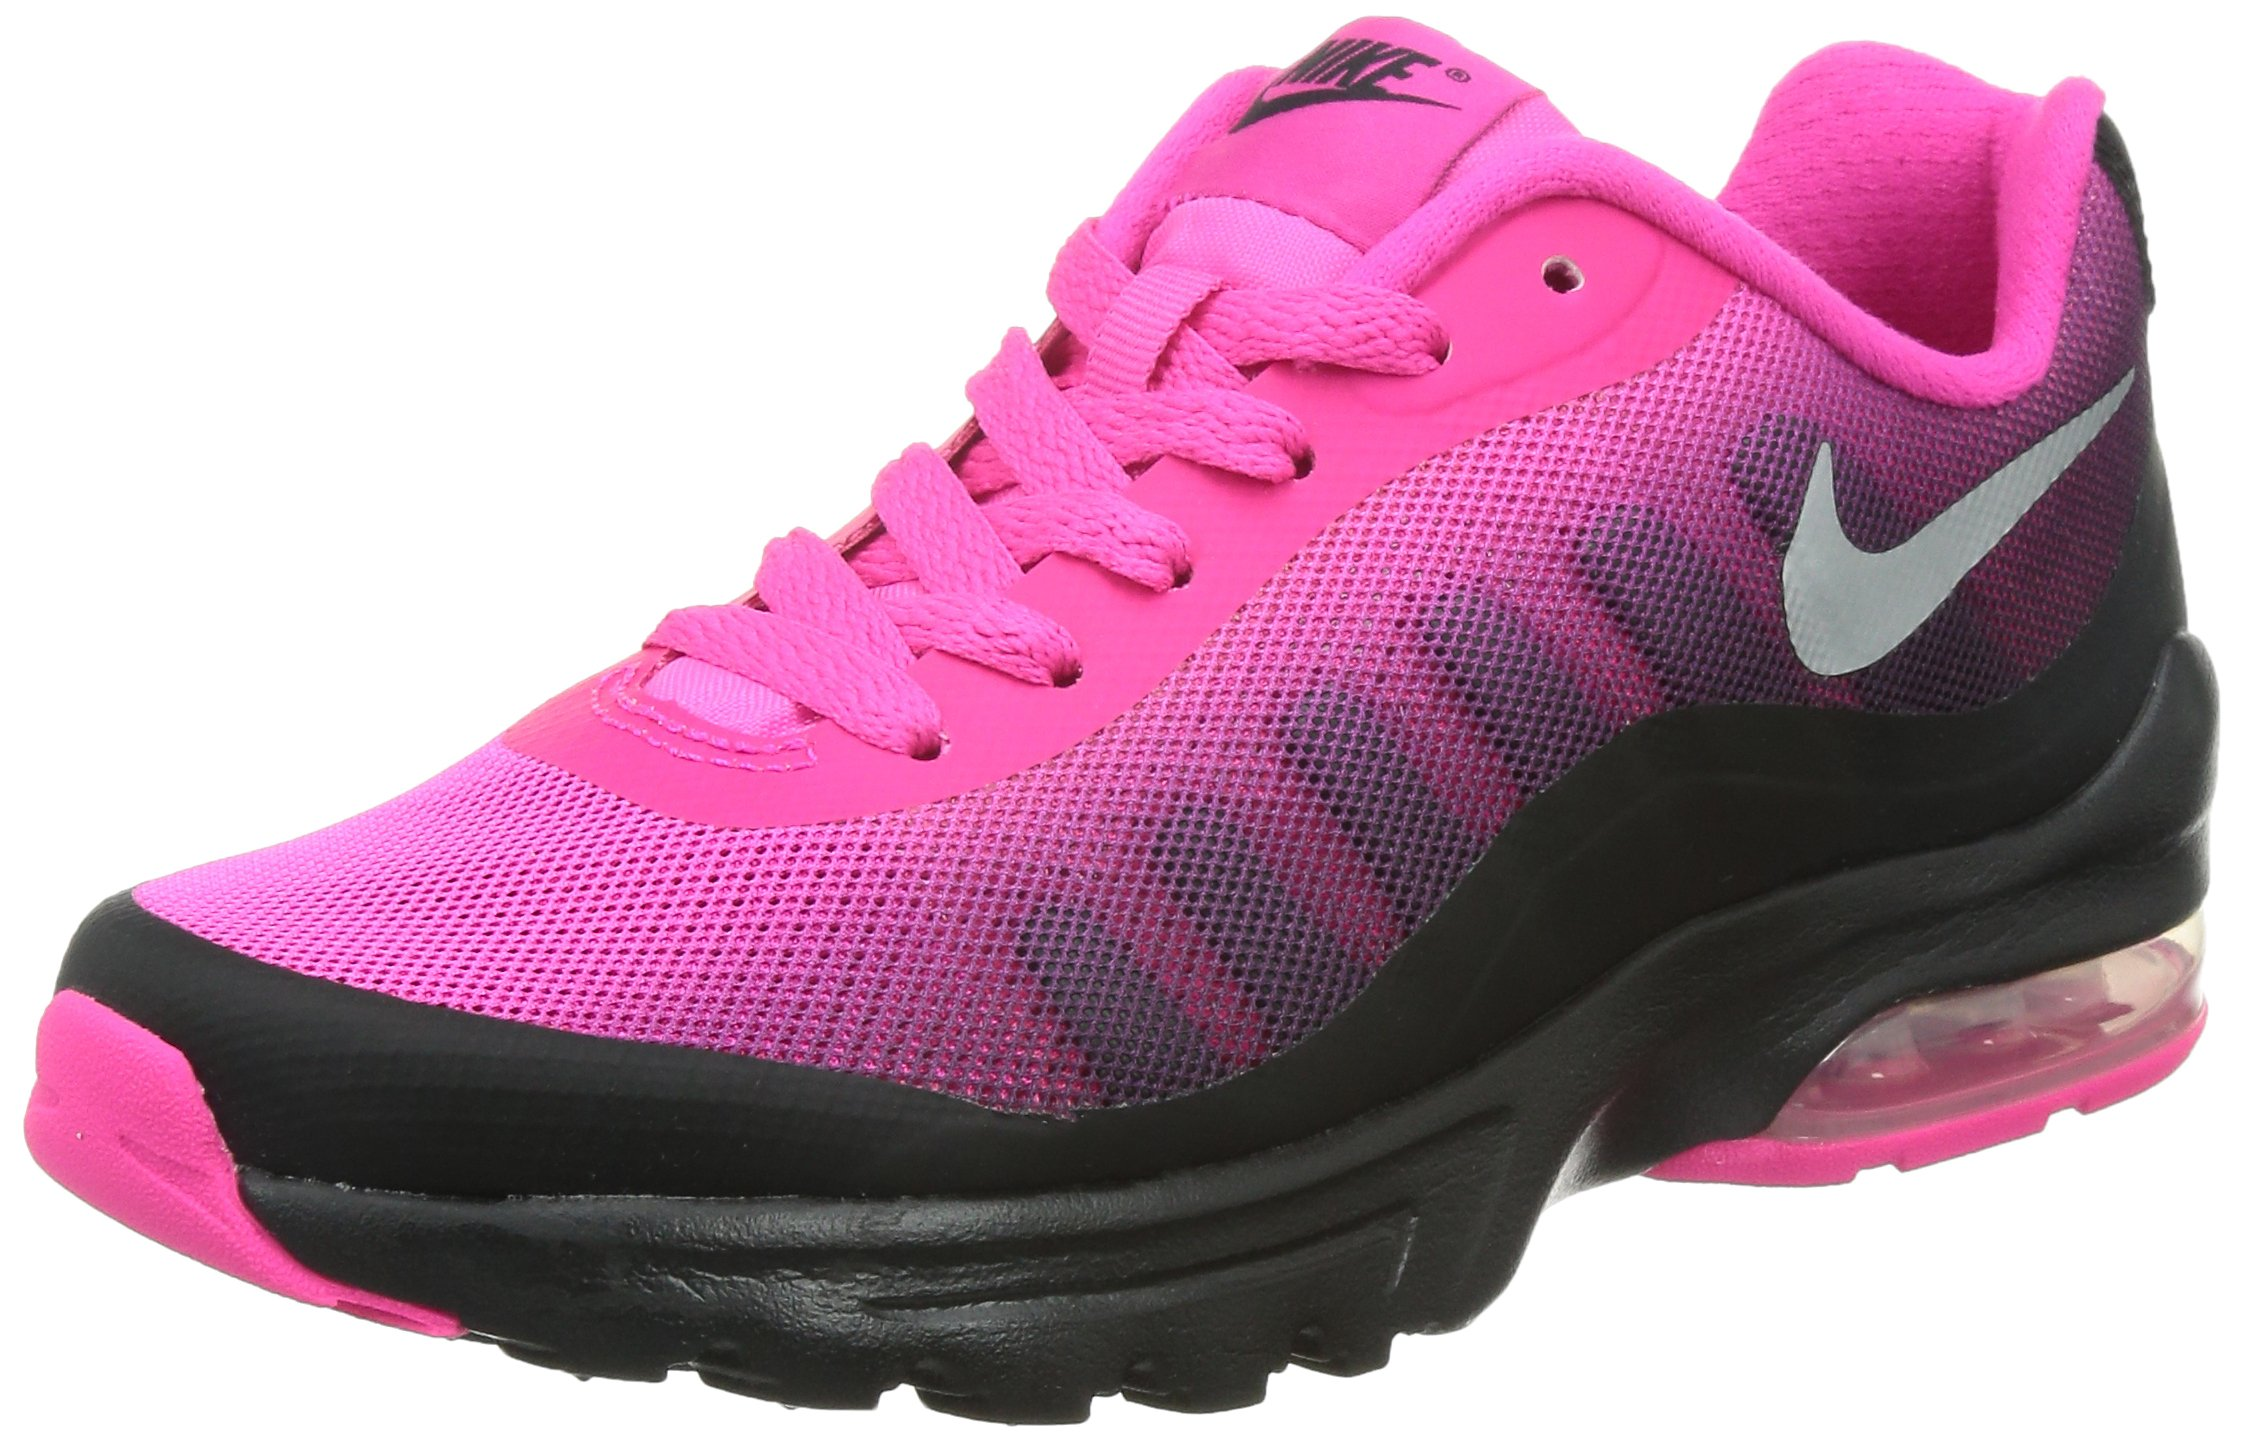 Nike Women's Air Max Invigor Print Black/Metallic Silver/Pink Fl/Sprt Fc Running Shoe 7.5 Women US by Nike (Image #1)